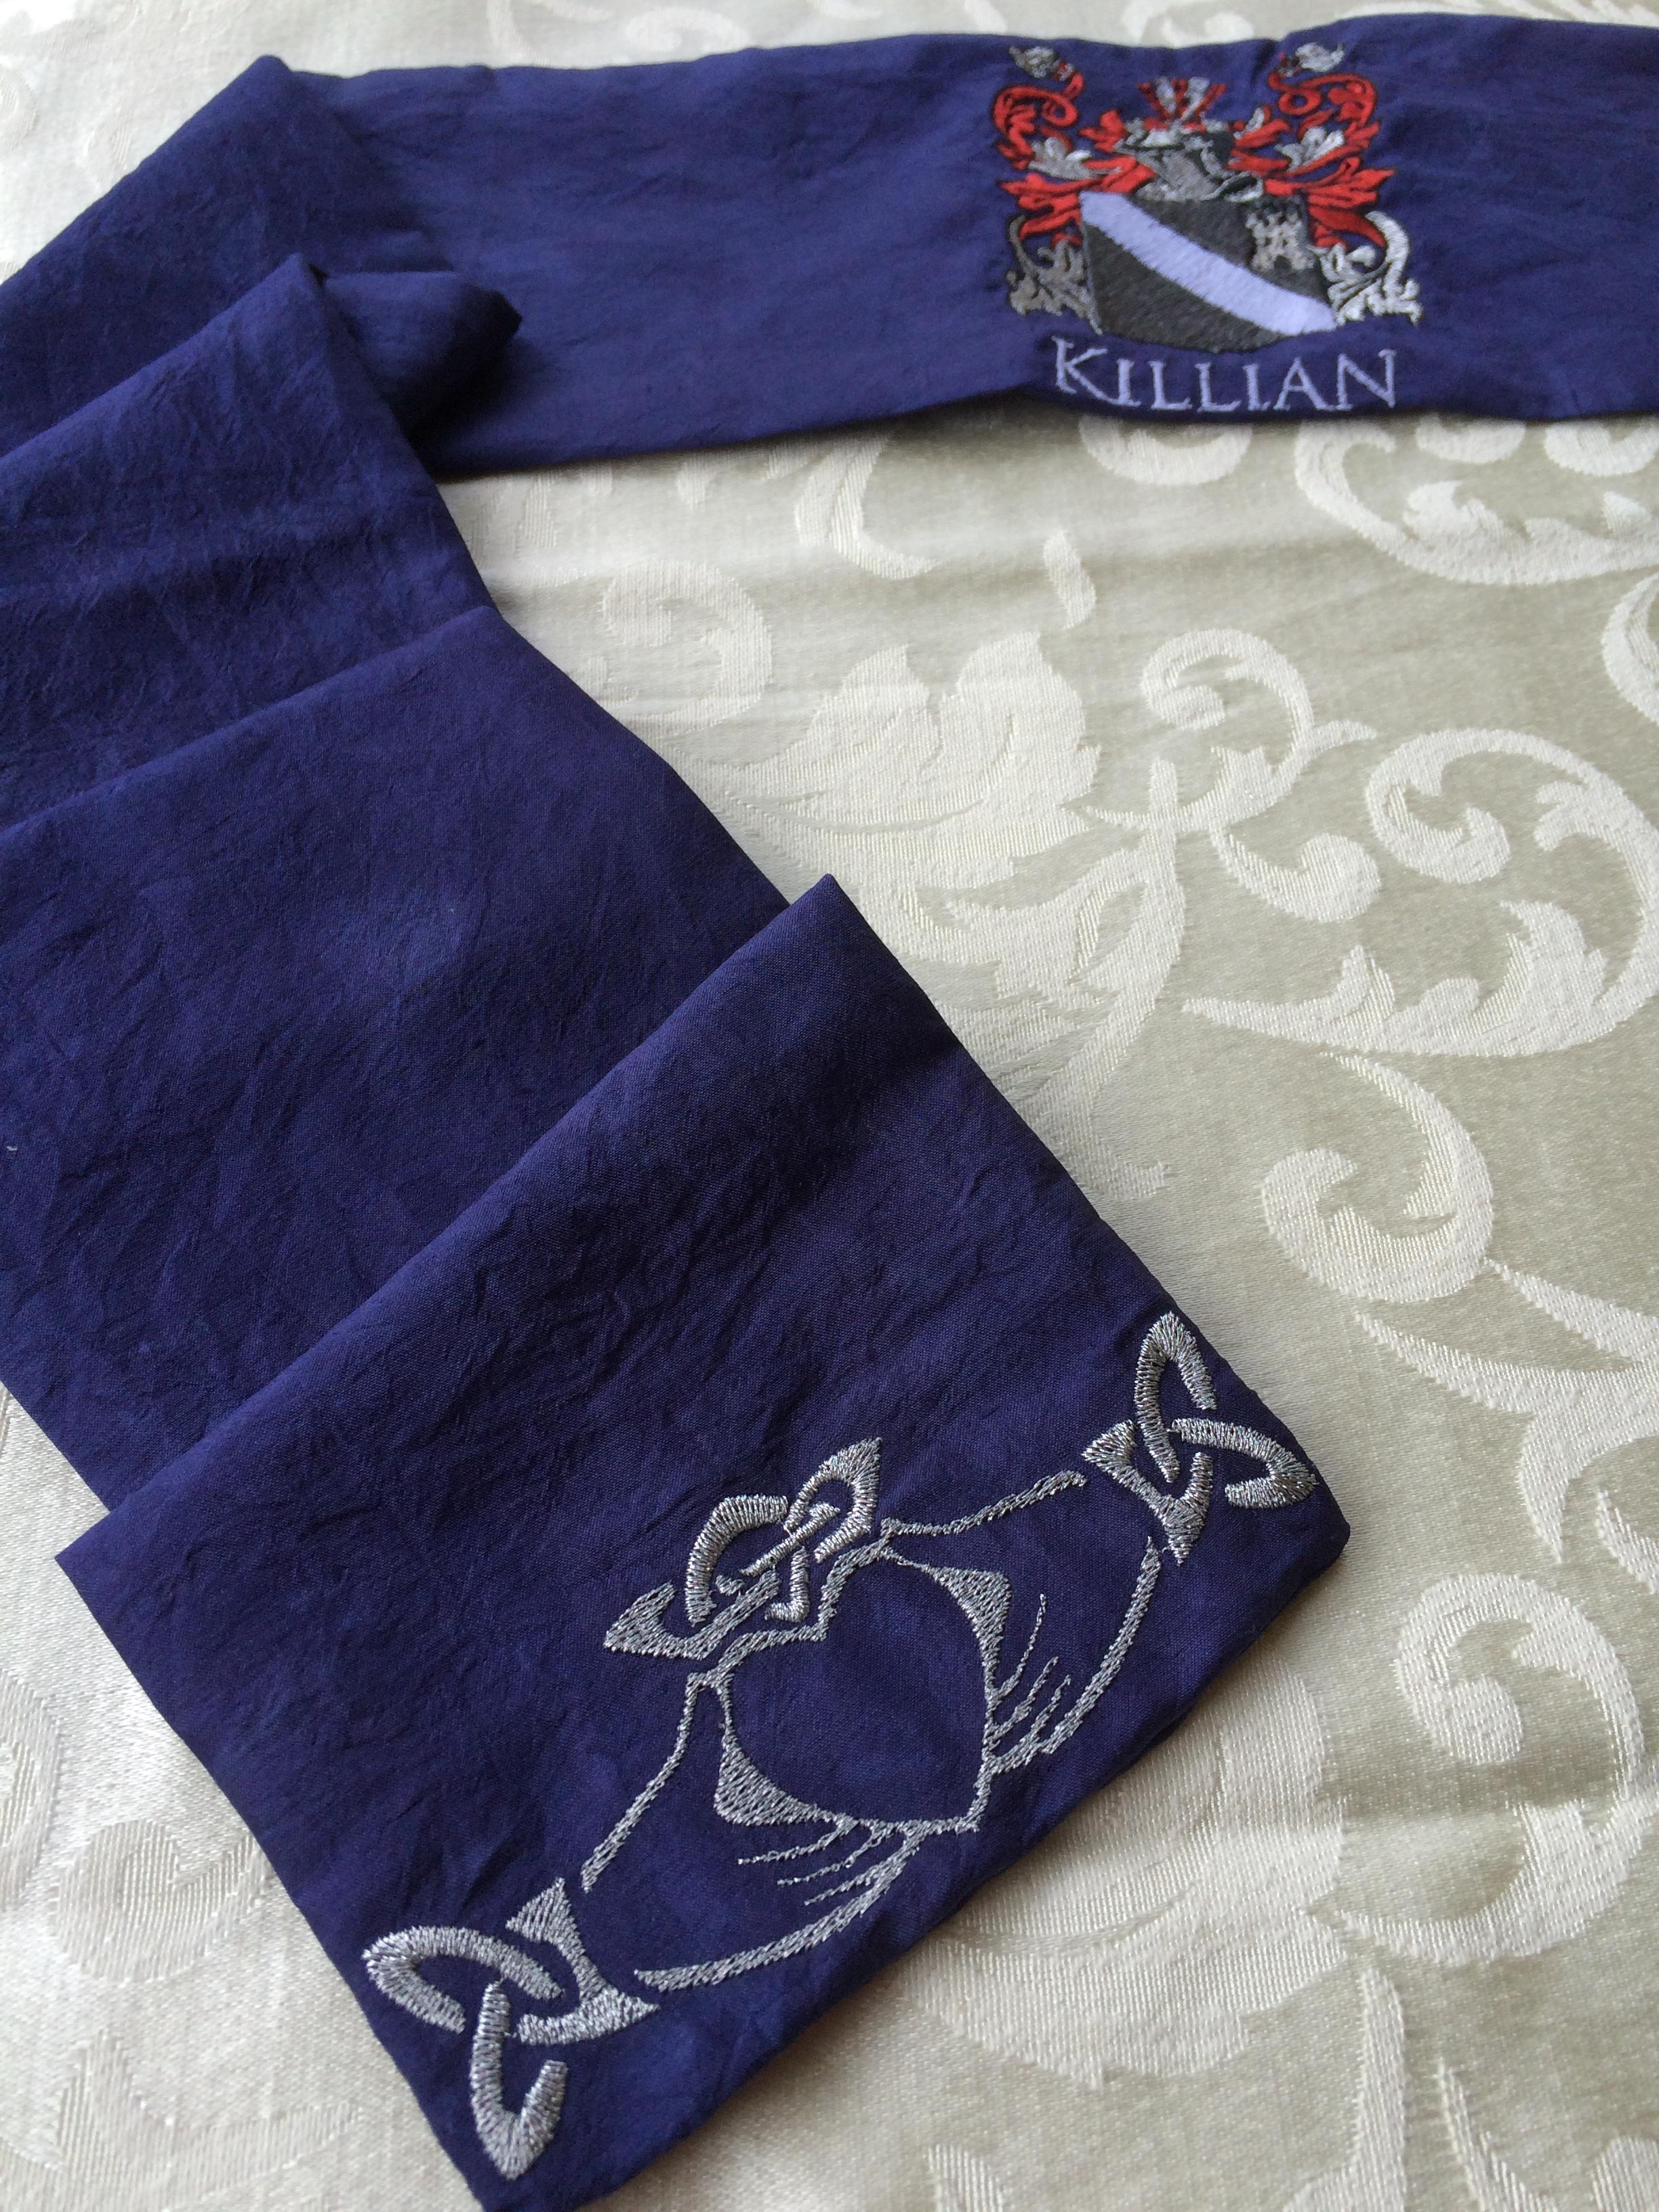 Custom-dyed blue silk cloth<br> with family crest.